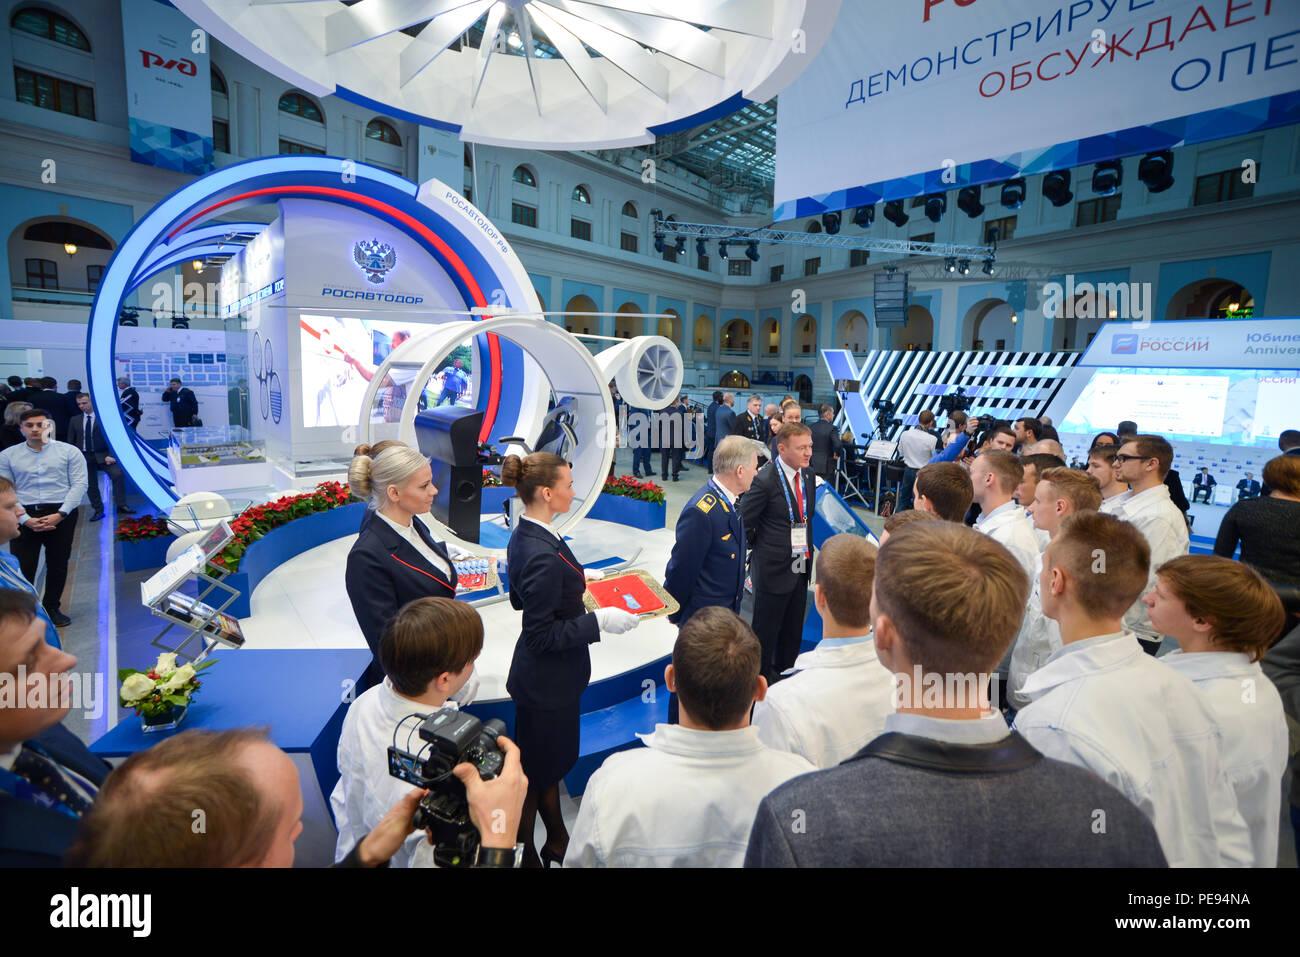 73fb9e7636e4 Rosavtodor booth at TransRussia 2016 - transport exhibition in Moscow